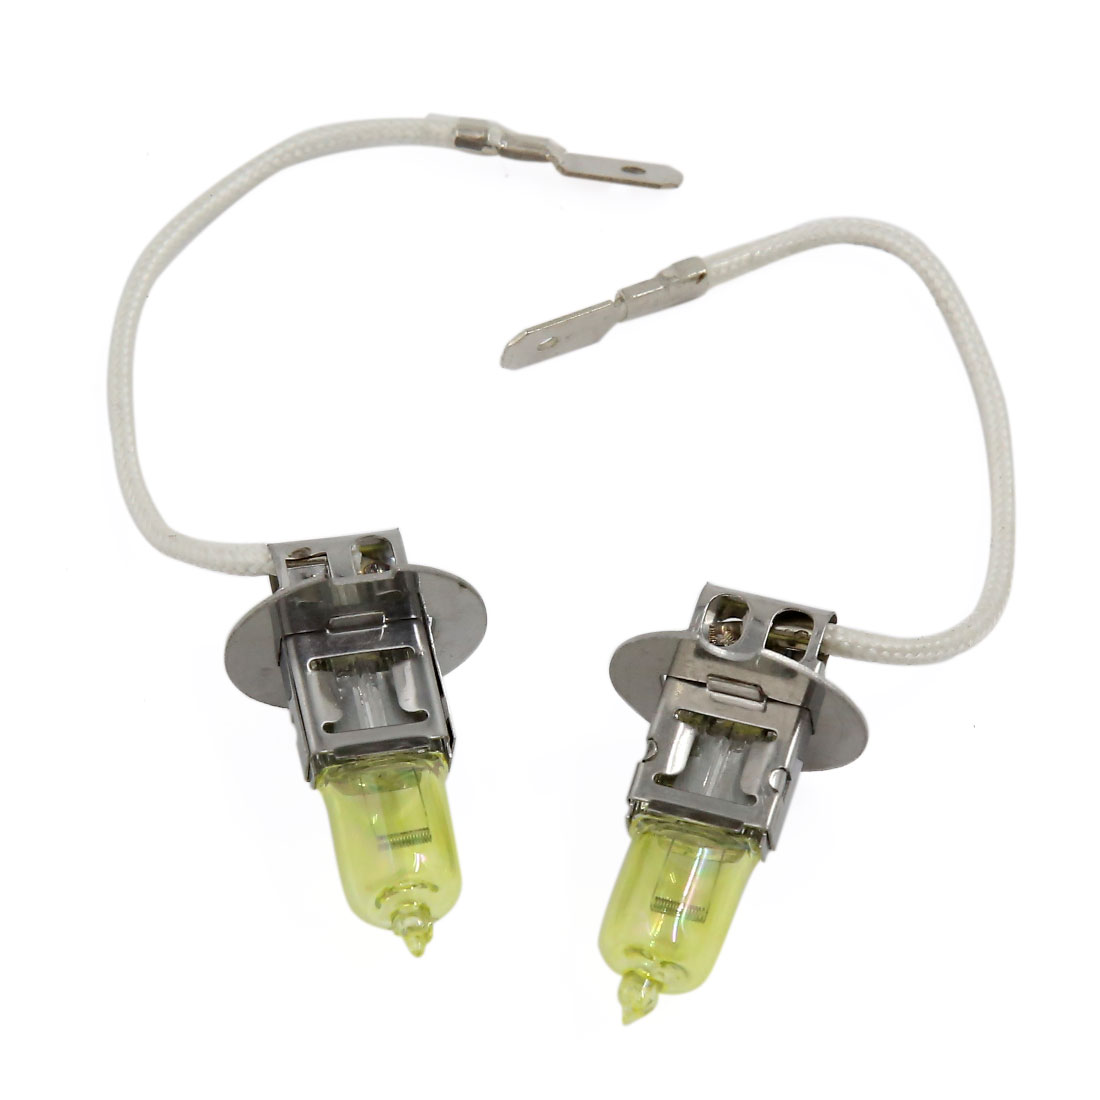 2 Pcs H3 50W Amber Halogen Light Xenon Gas Car Headlight Fog Lamp Bulbs 12V